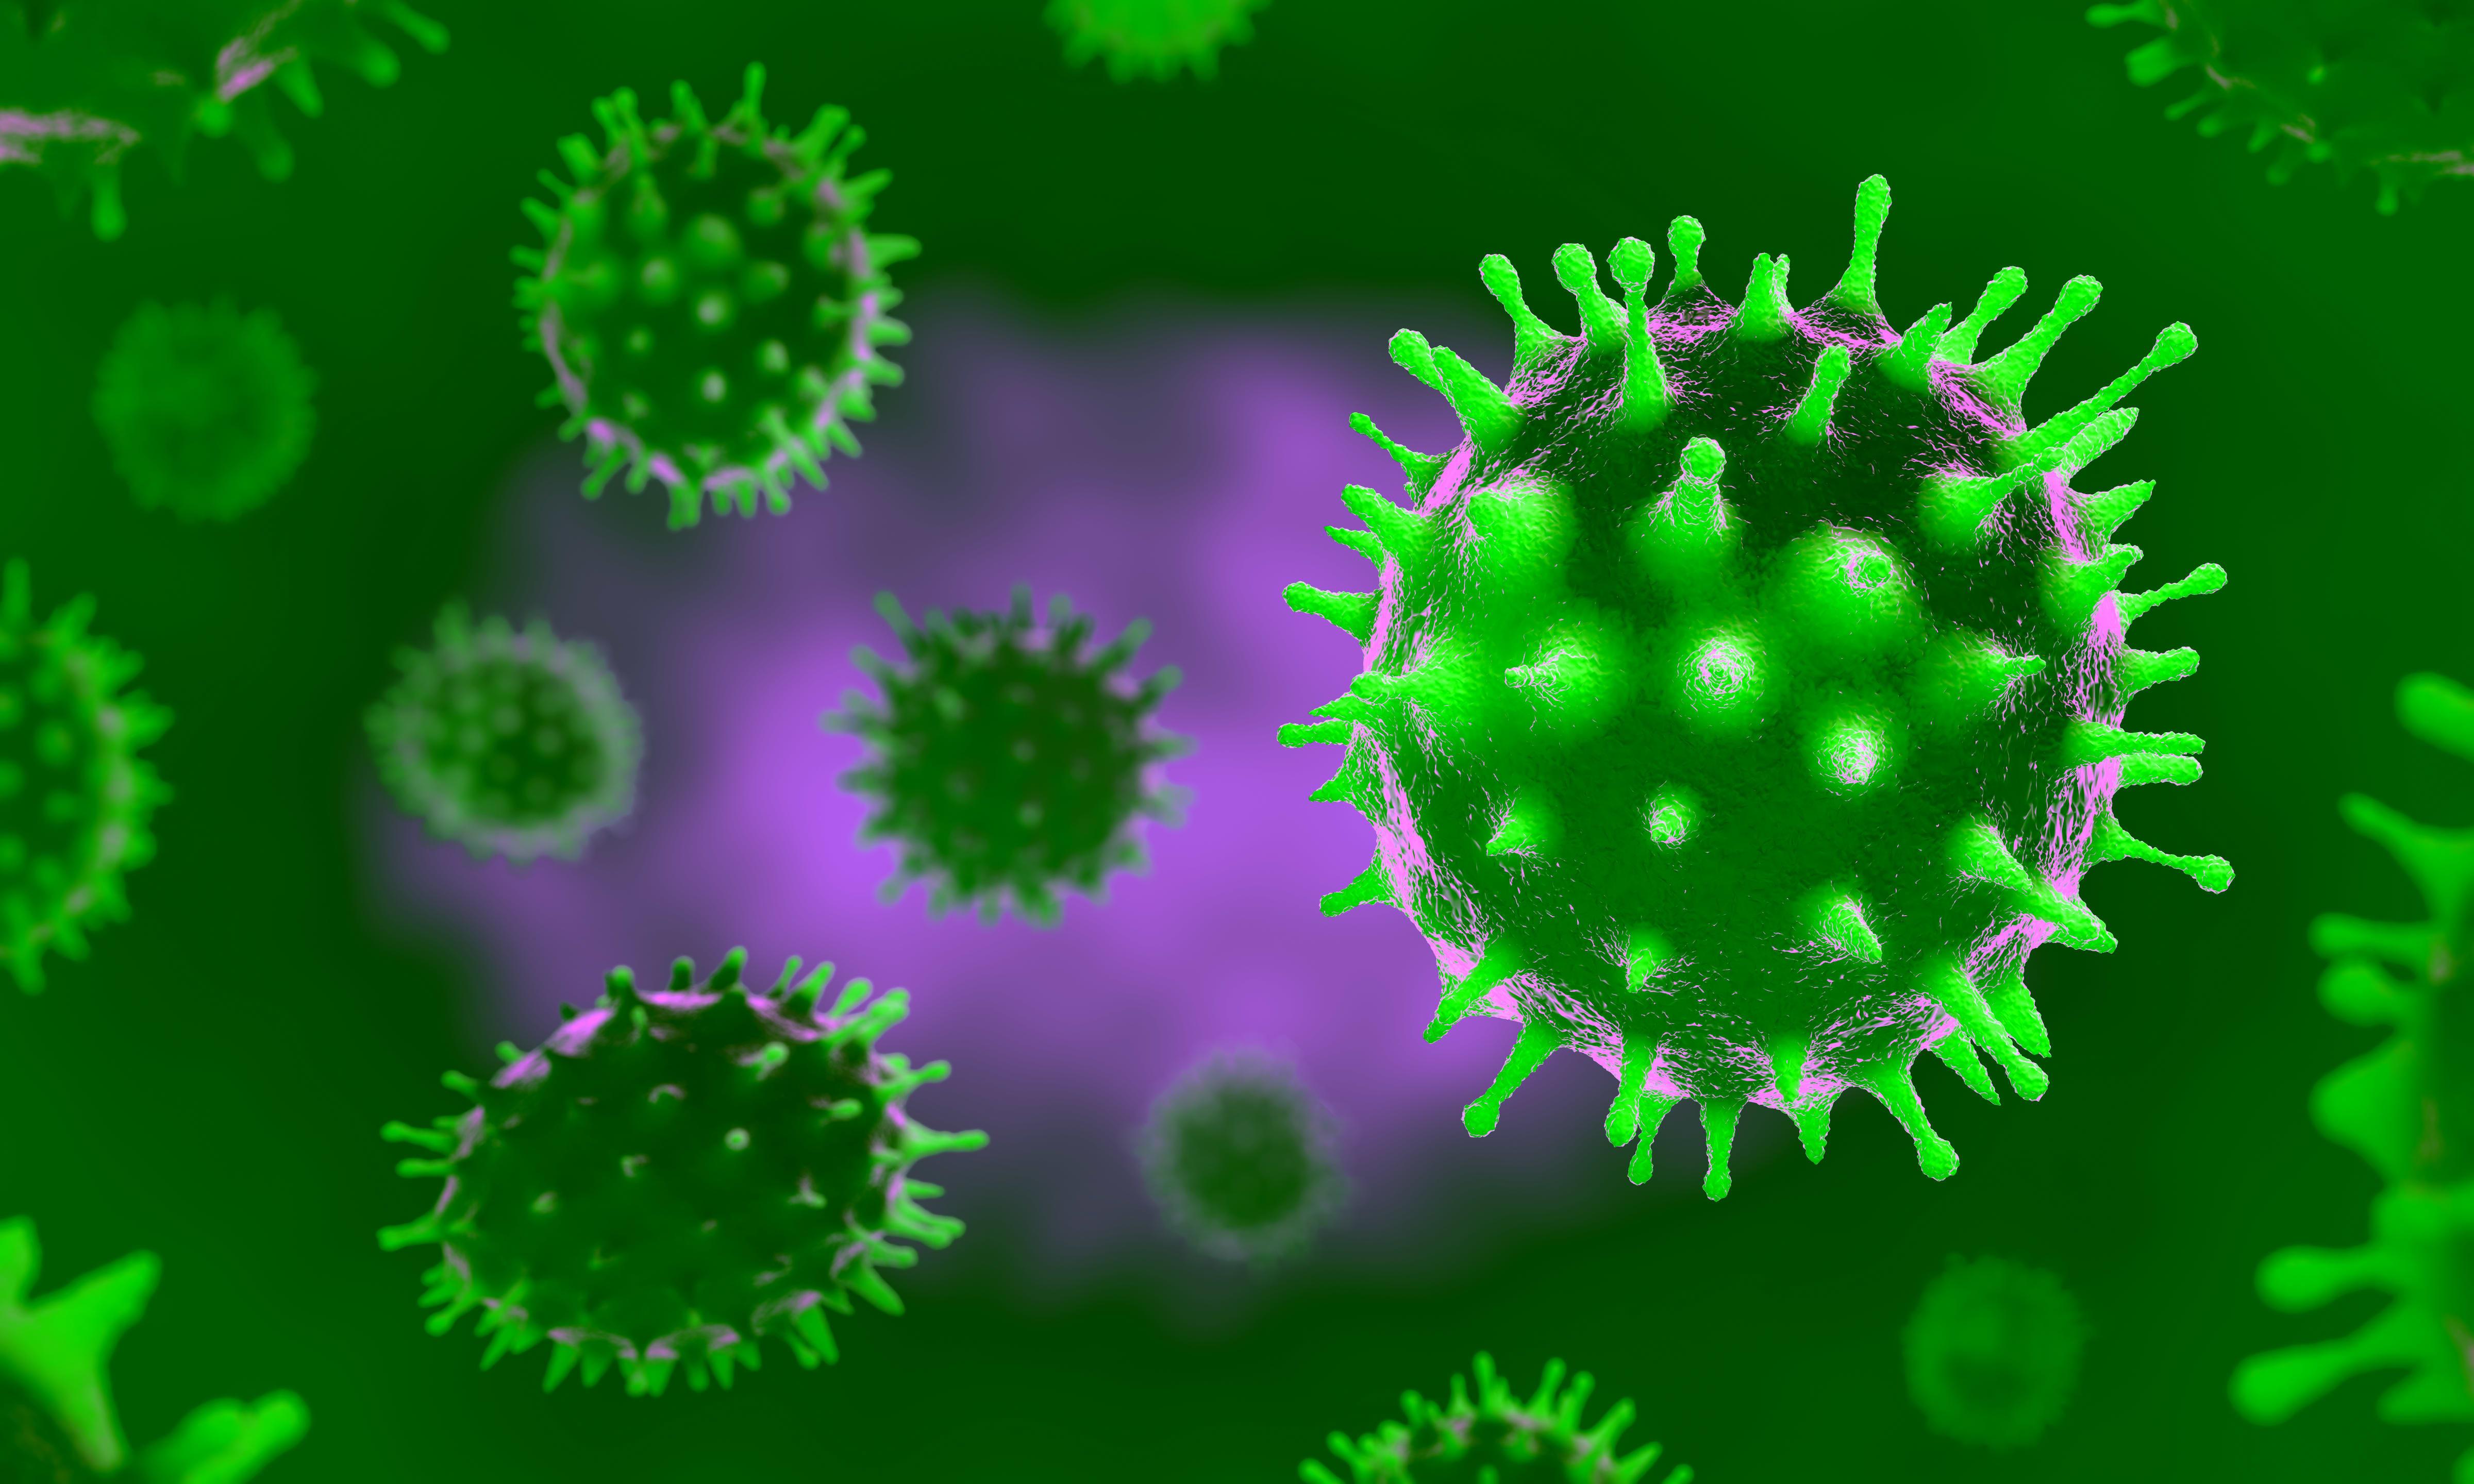 Corona Virus Microscope Image Hd